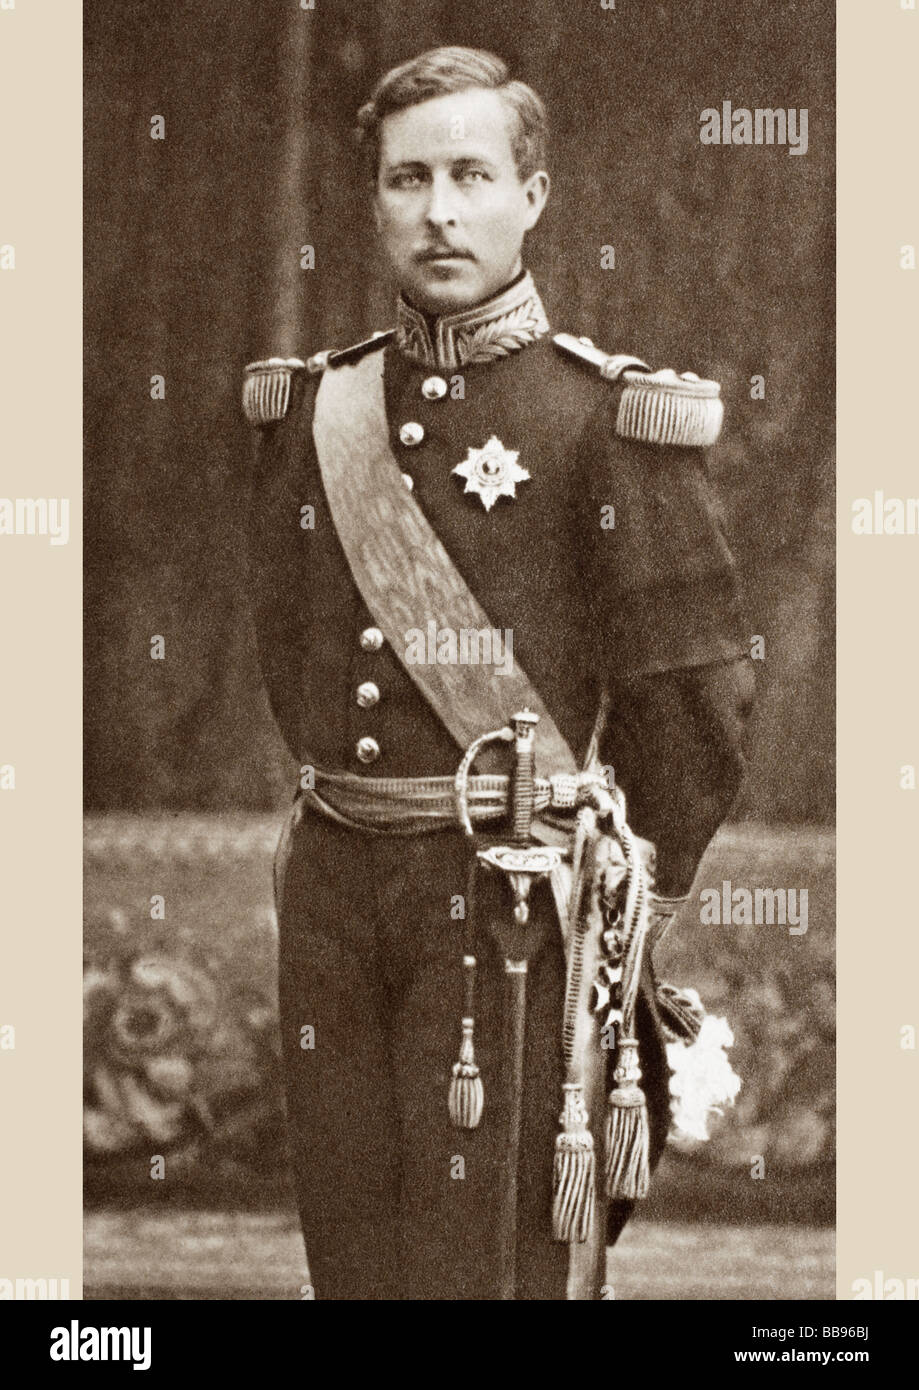 Albert I, 1875 to 1934. Third King of the Belgians.  Born Albert Léopold Clément Marie Meinrad. - Stock Image